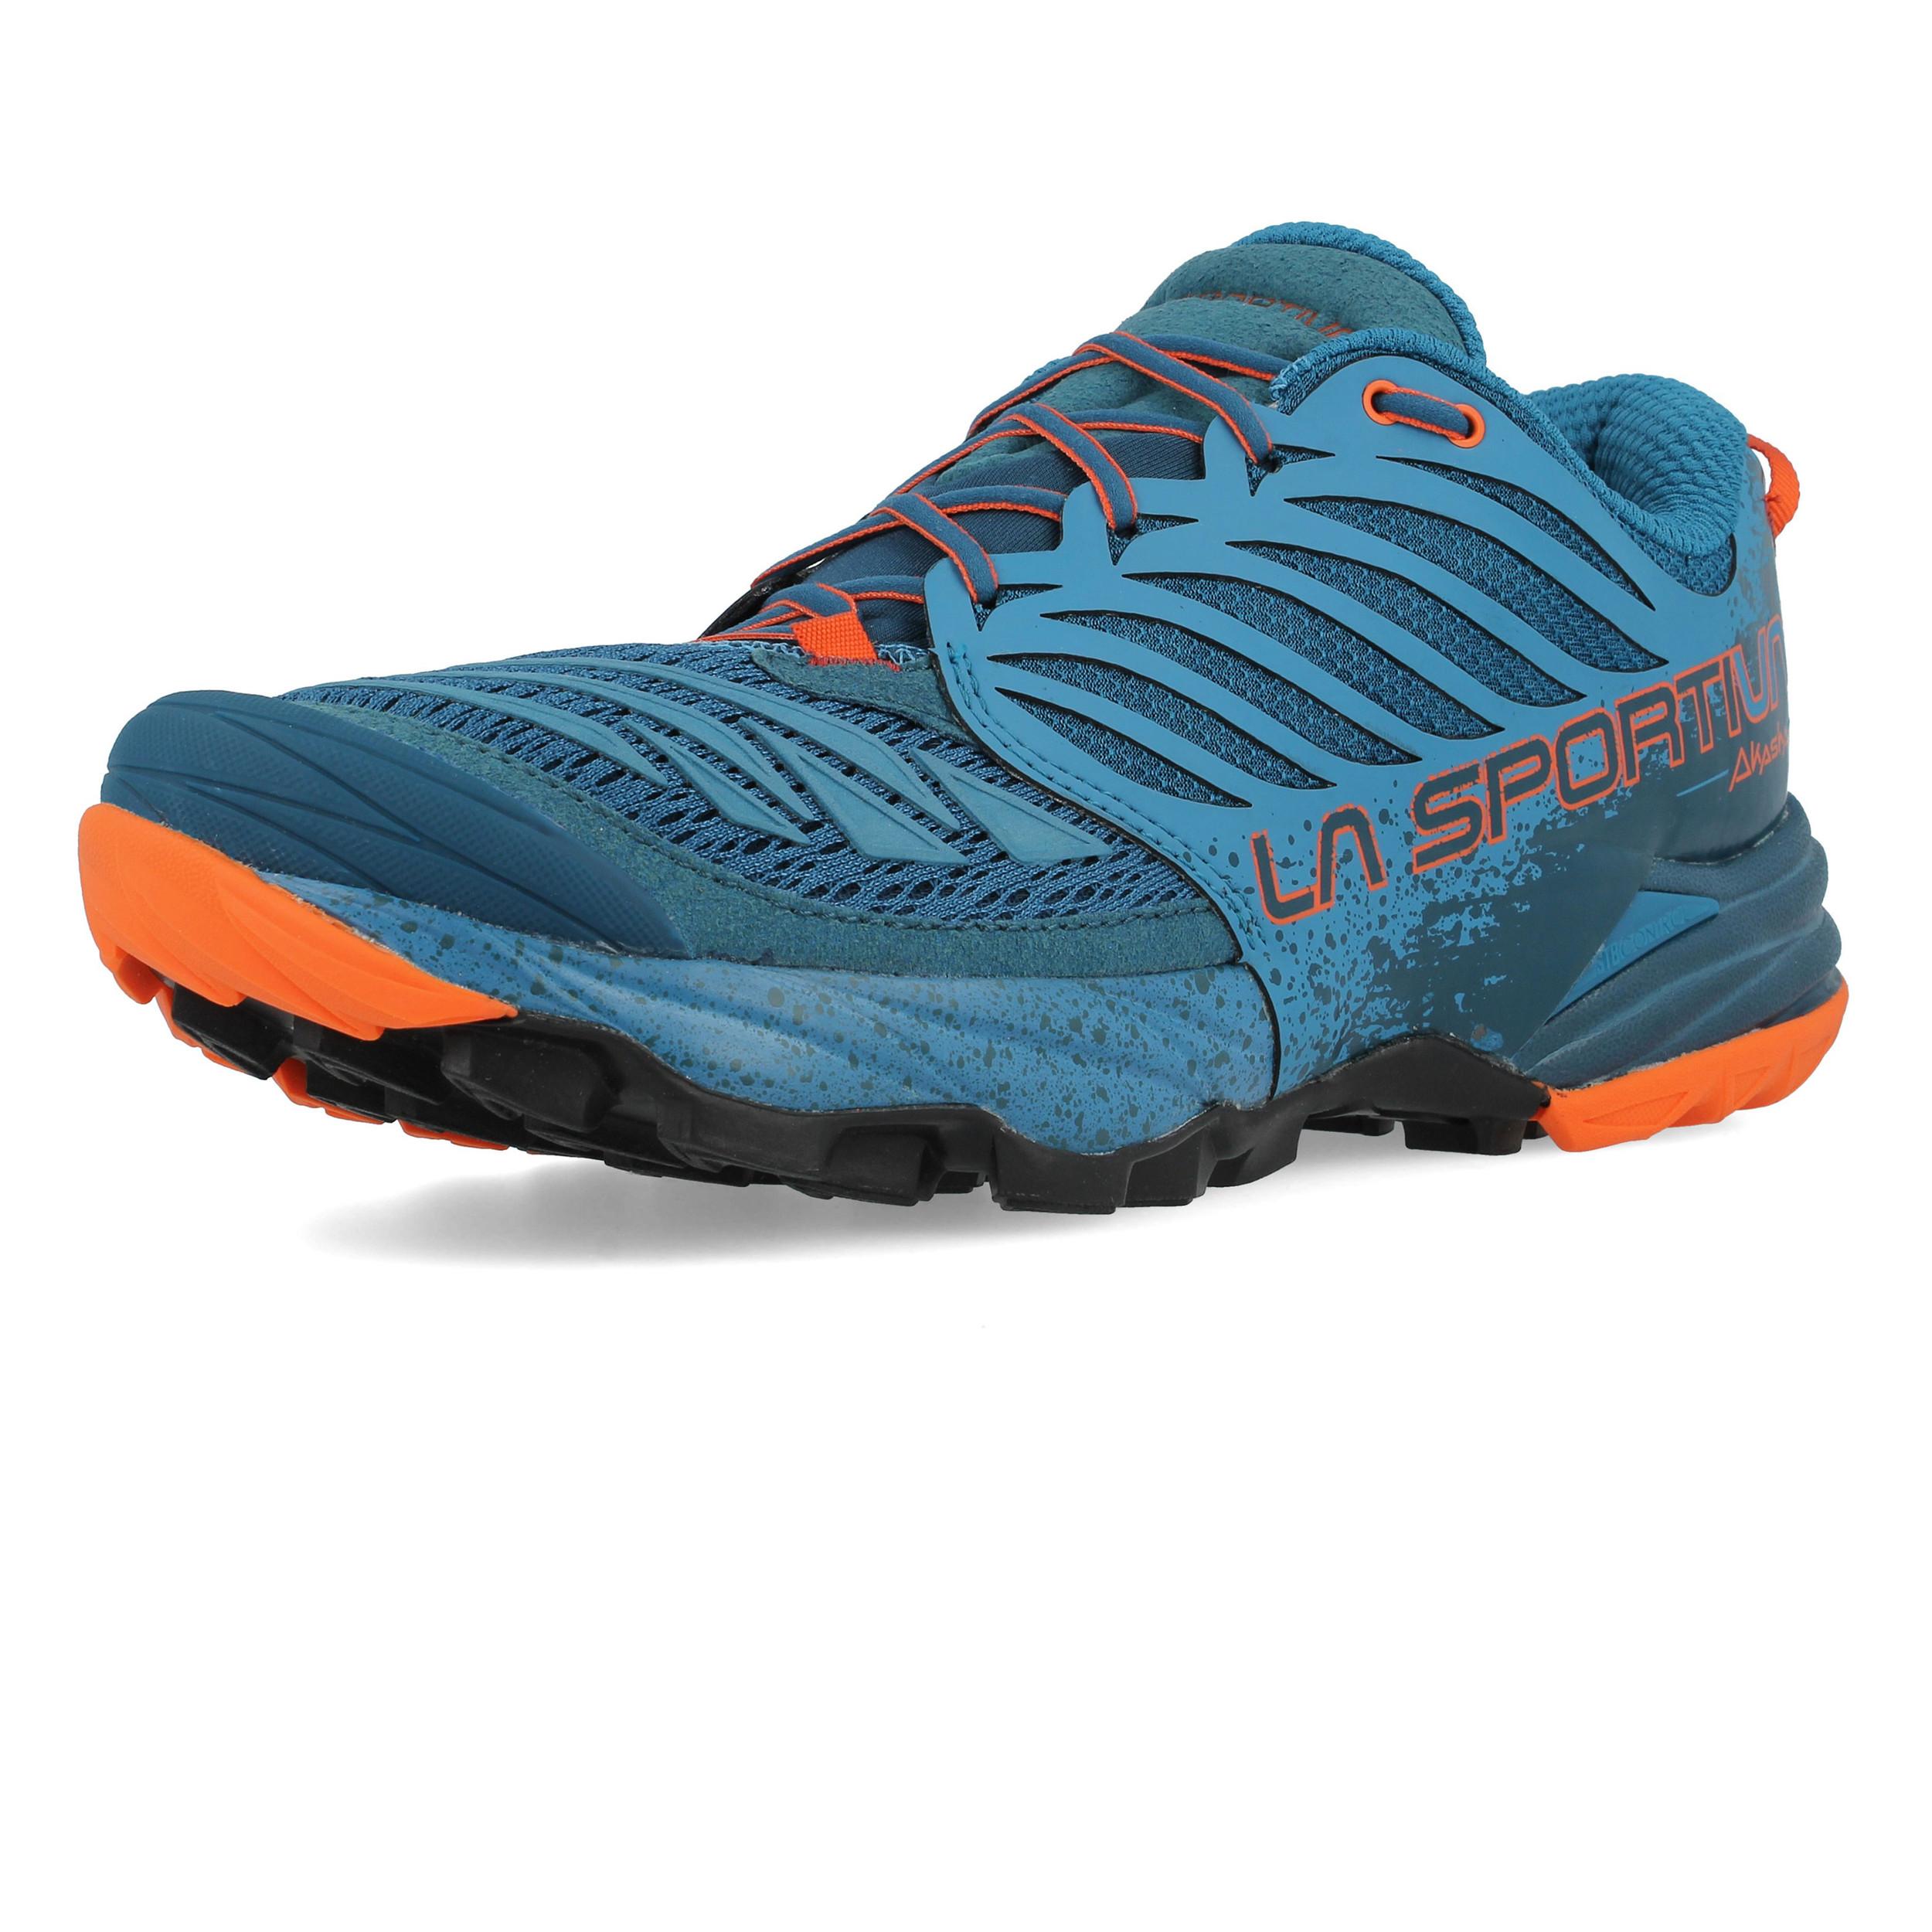 size 40 9c5b1 437f9 Details zu La Sportiva Akasha Trail Herren Laufschuhe Jogging Turnschuhe  Sport Schuhe Blau